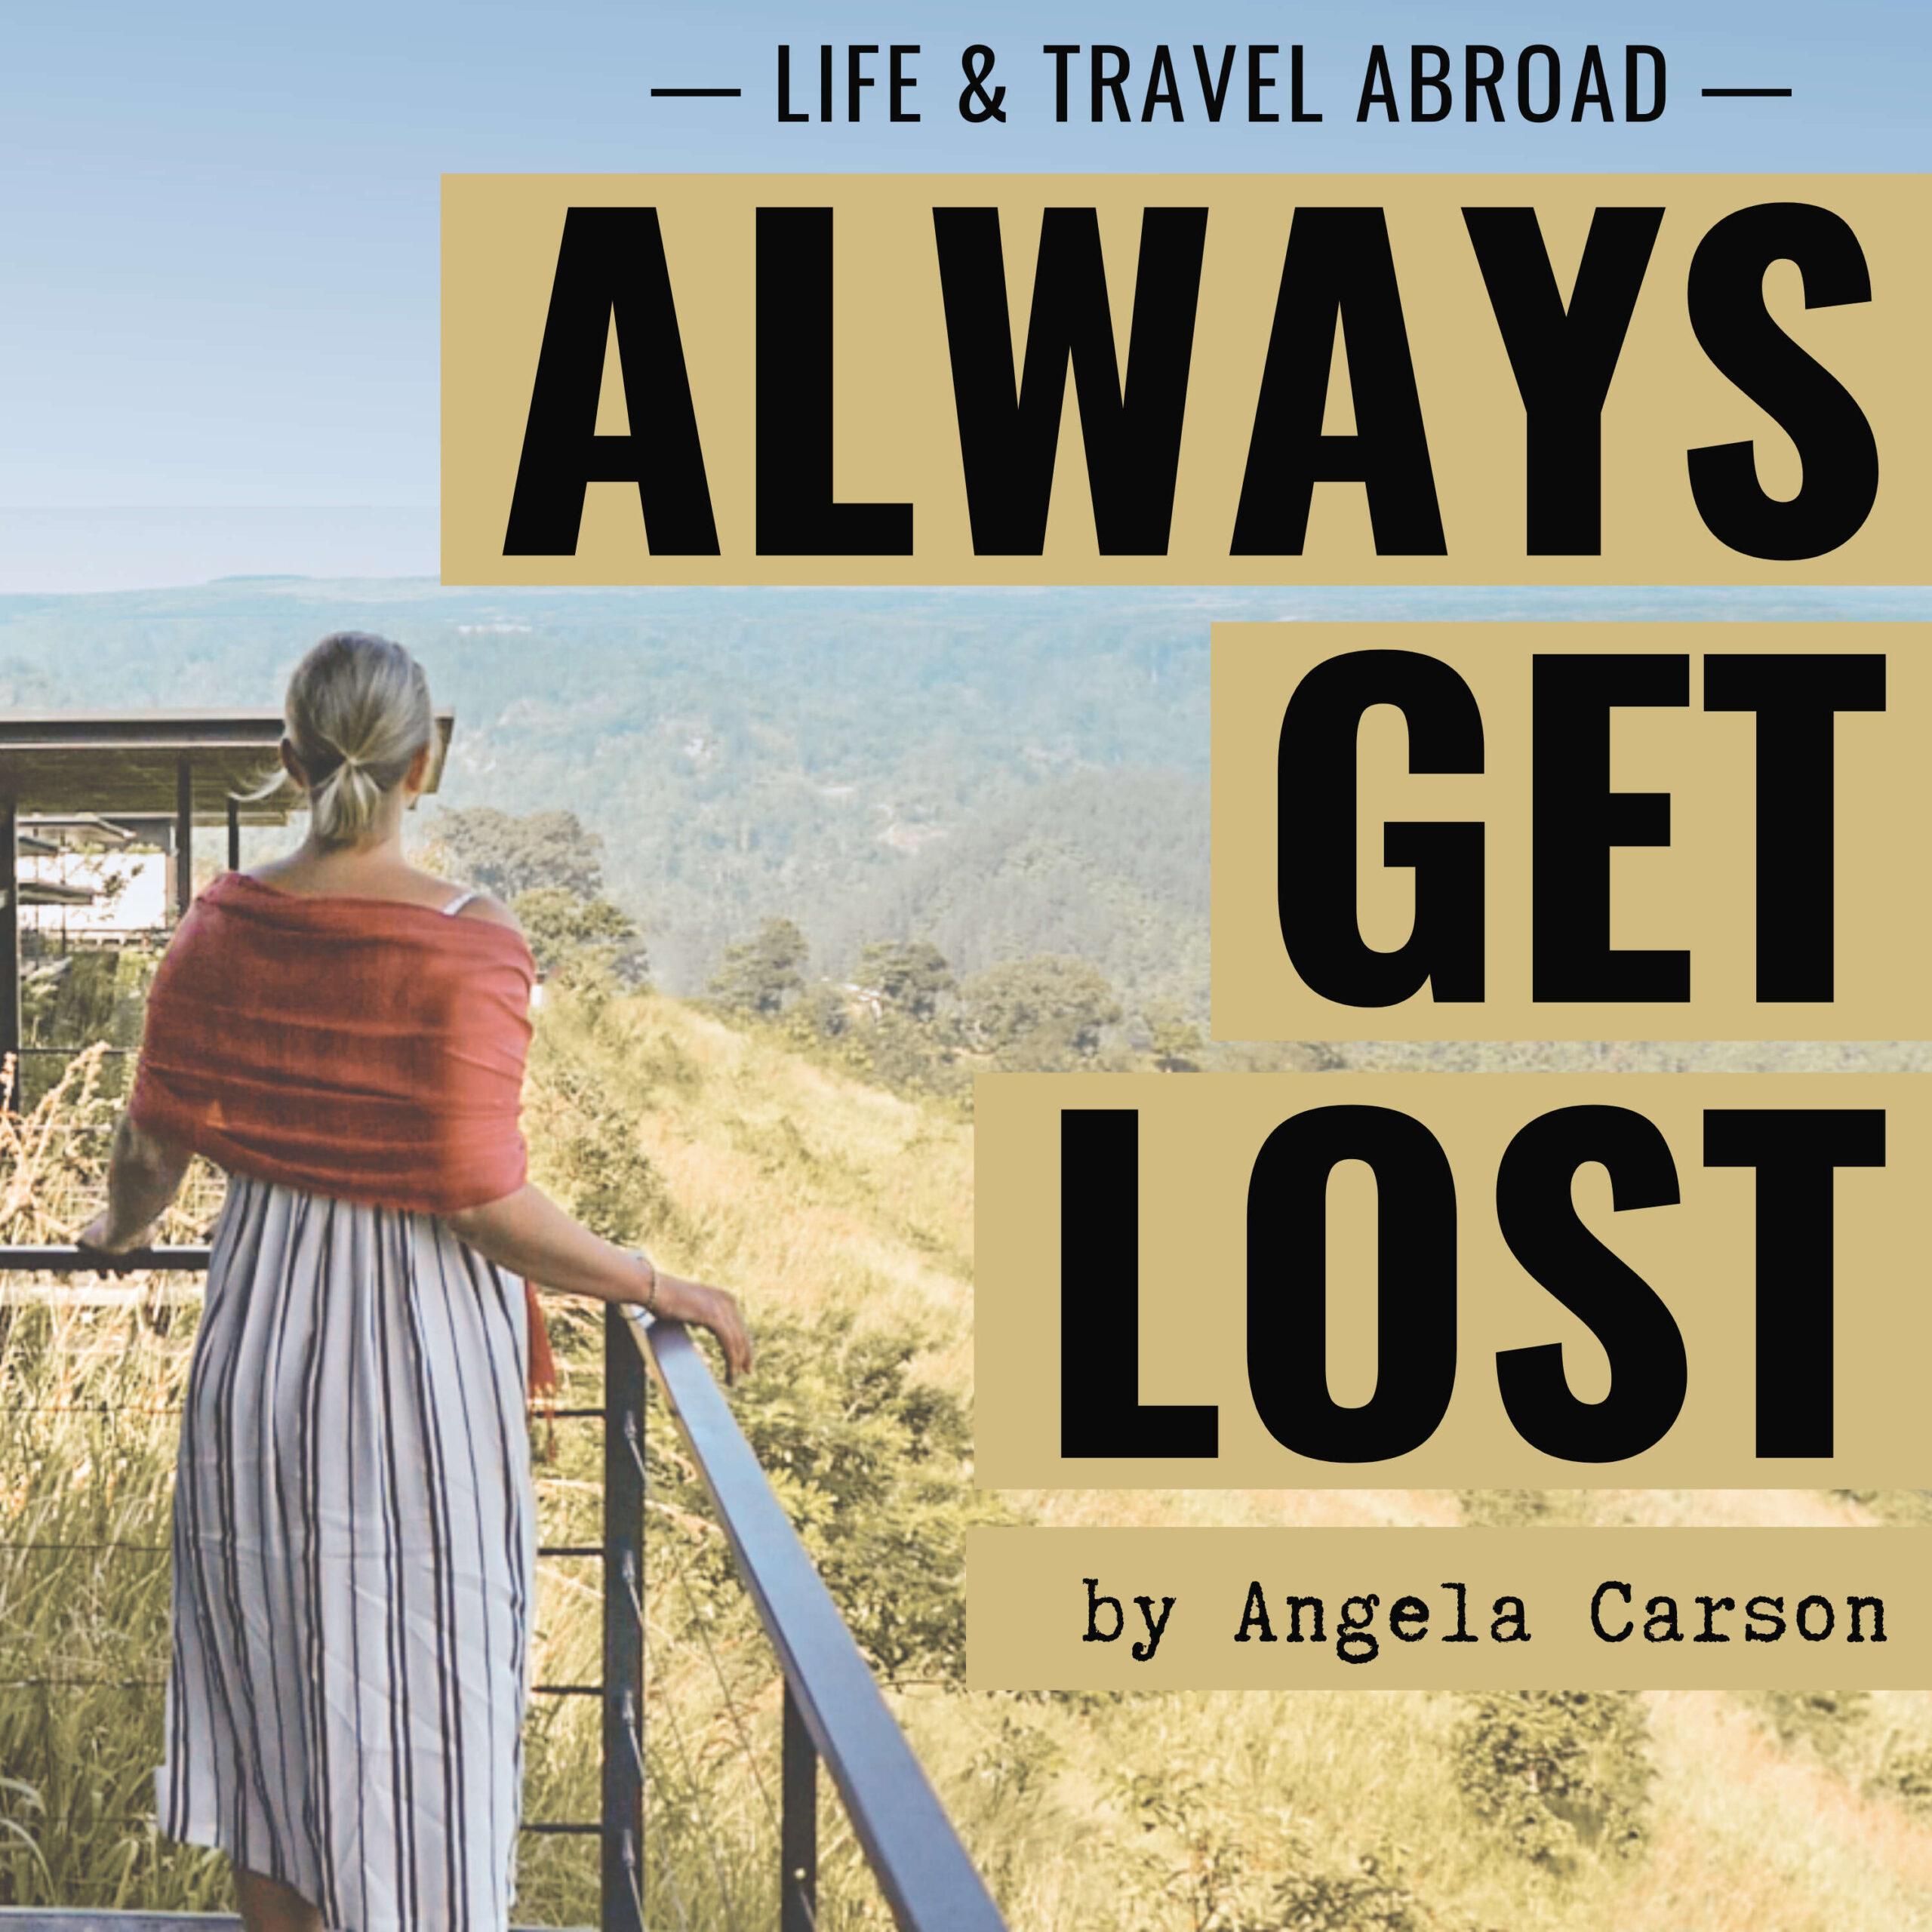 ALWAYS GET LOST by Angela Carson